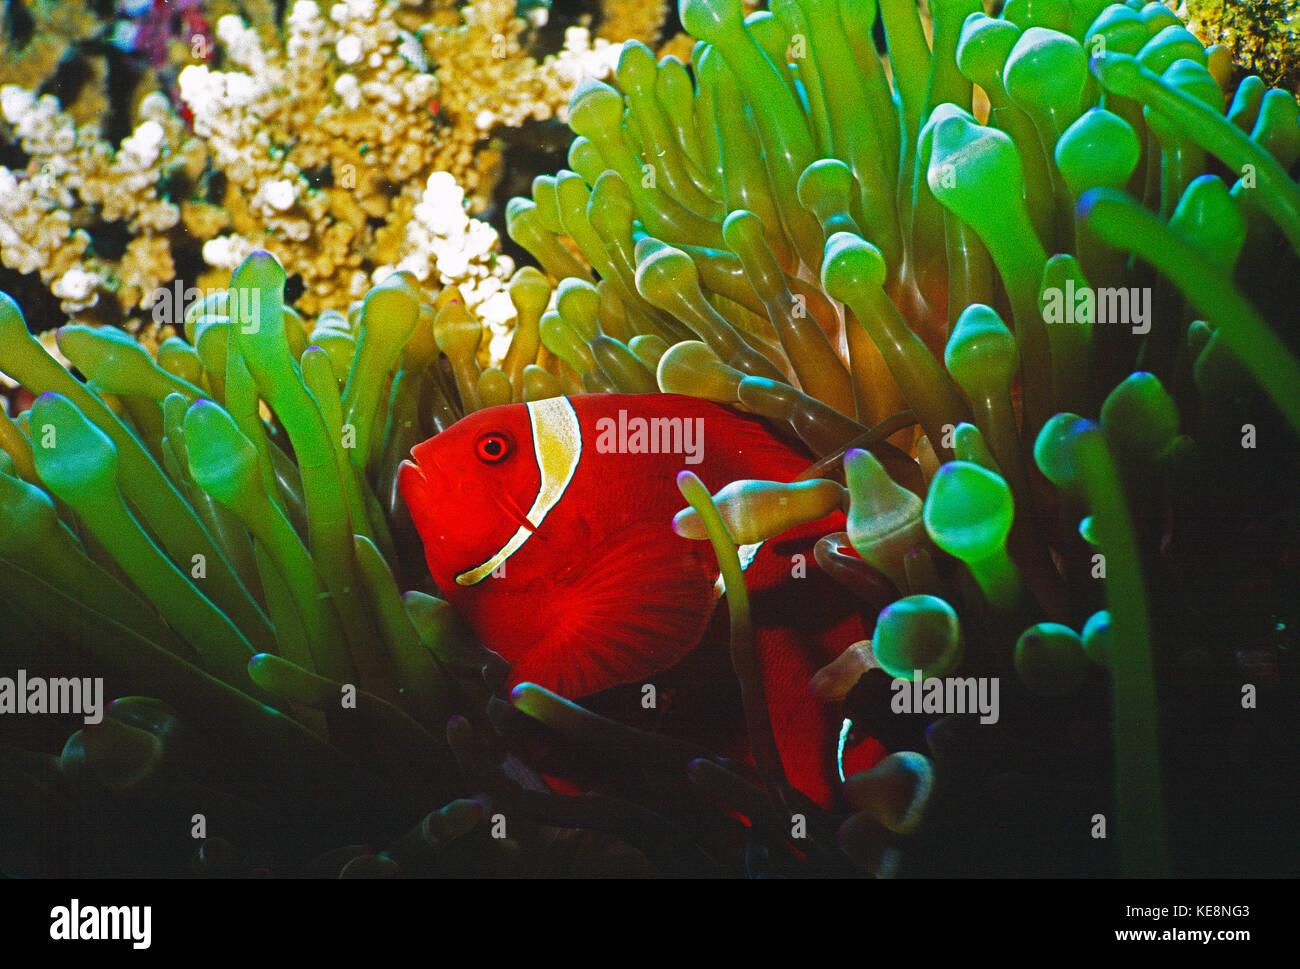 Indonesia. Sulawesi. Wakatobi. Maroon Clownfish. - Stock Image